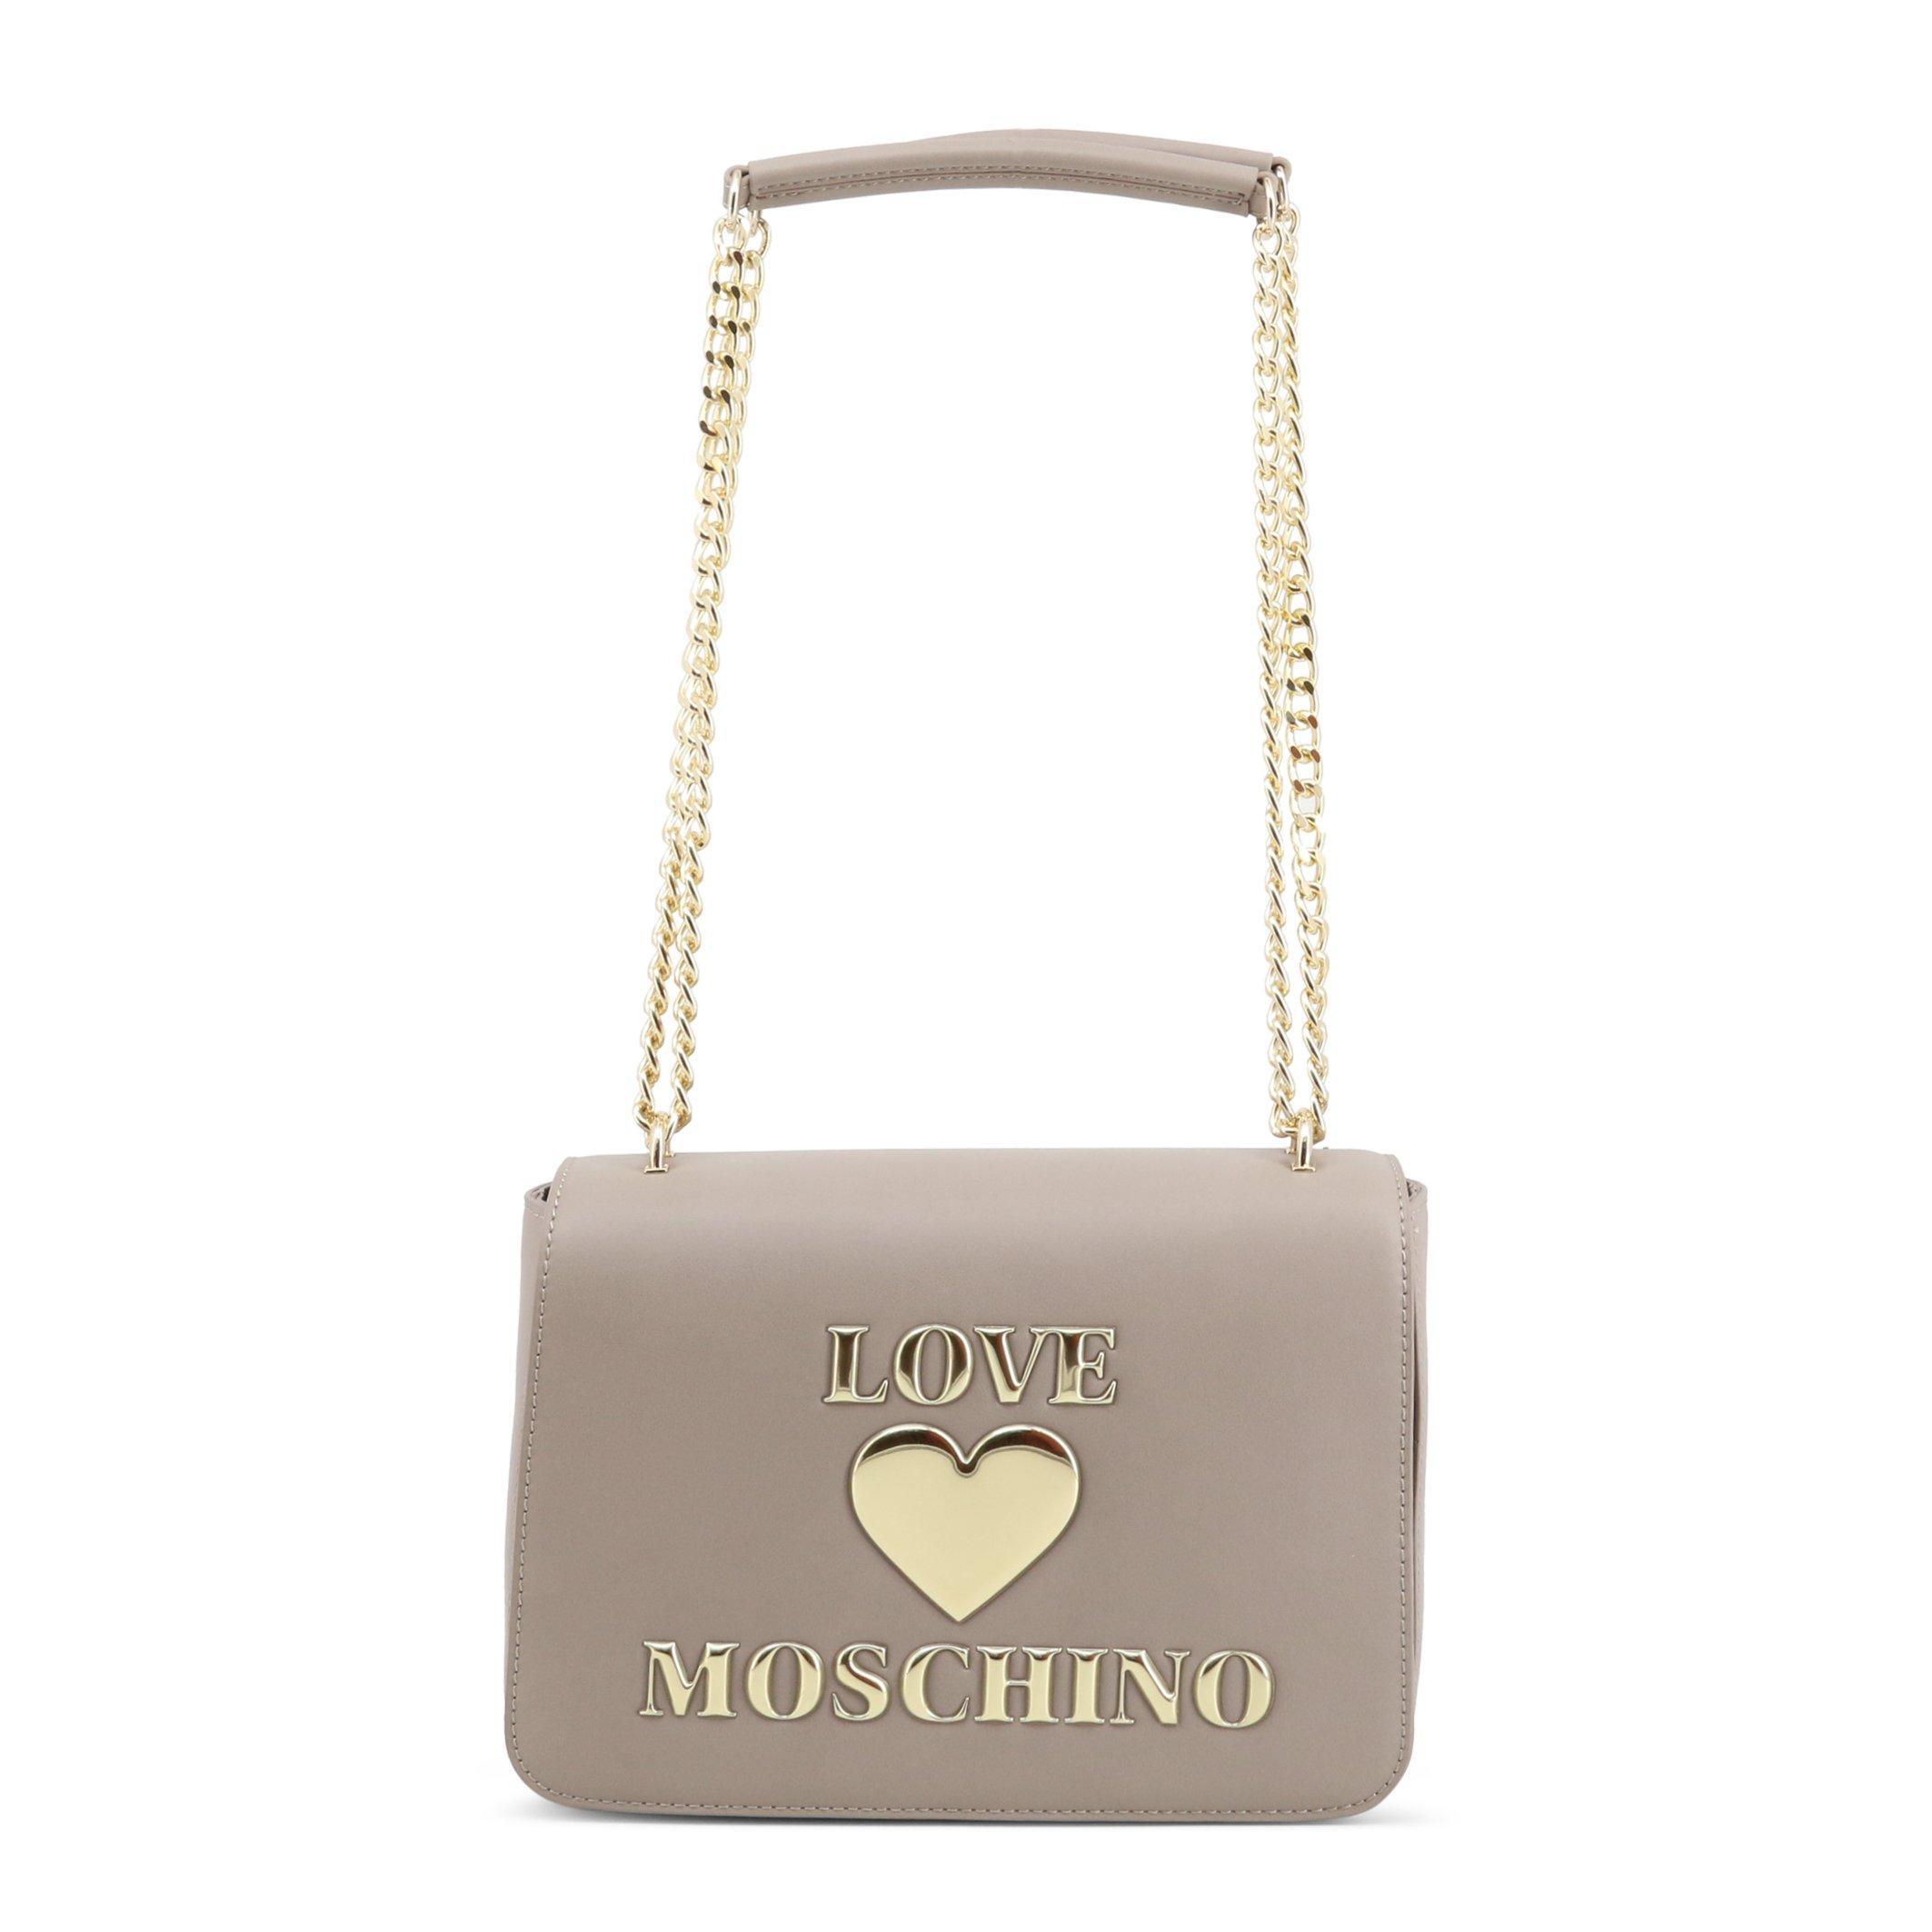 Love Moschino Women's Shoulder Bag Various Colours JC4035PP1BLE - grey NOSIZE